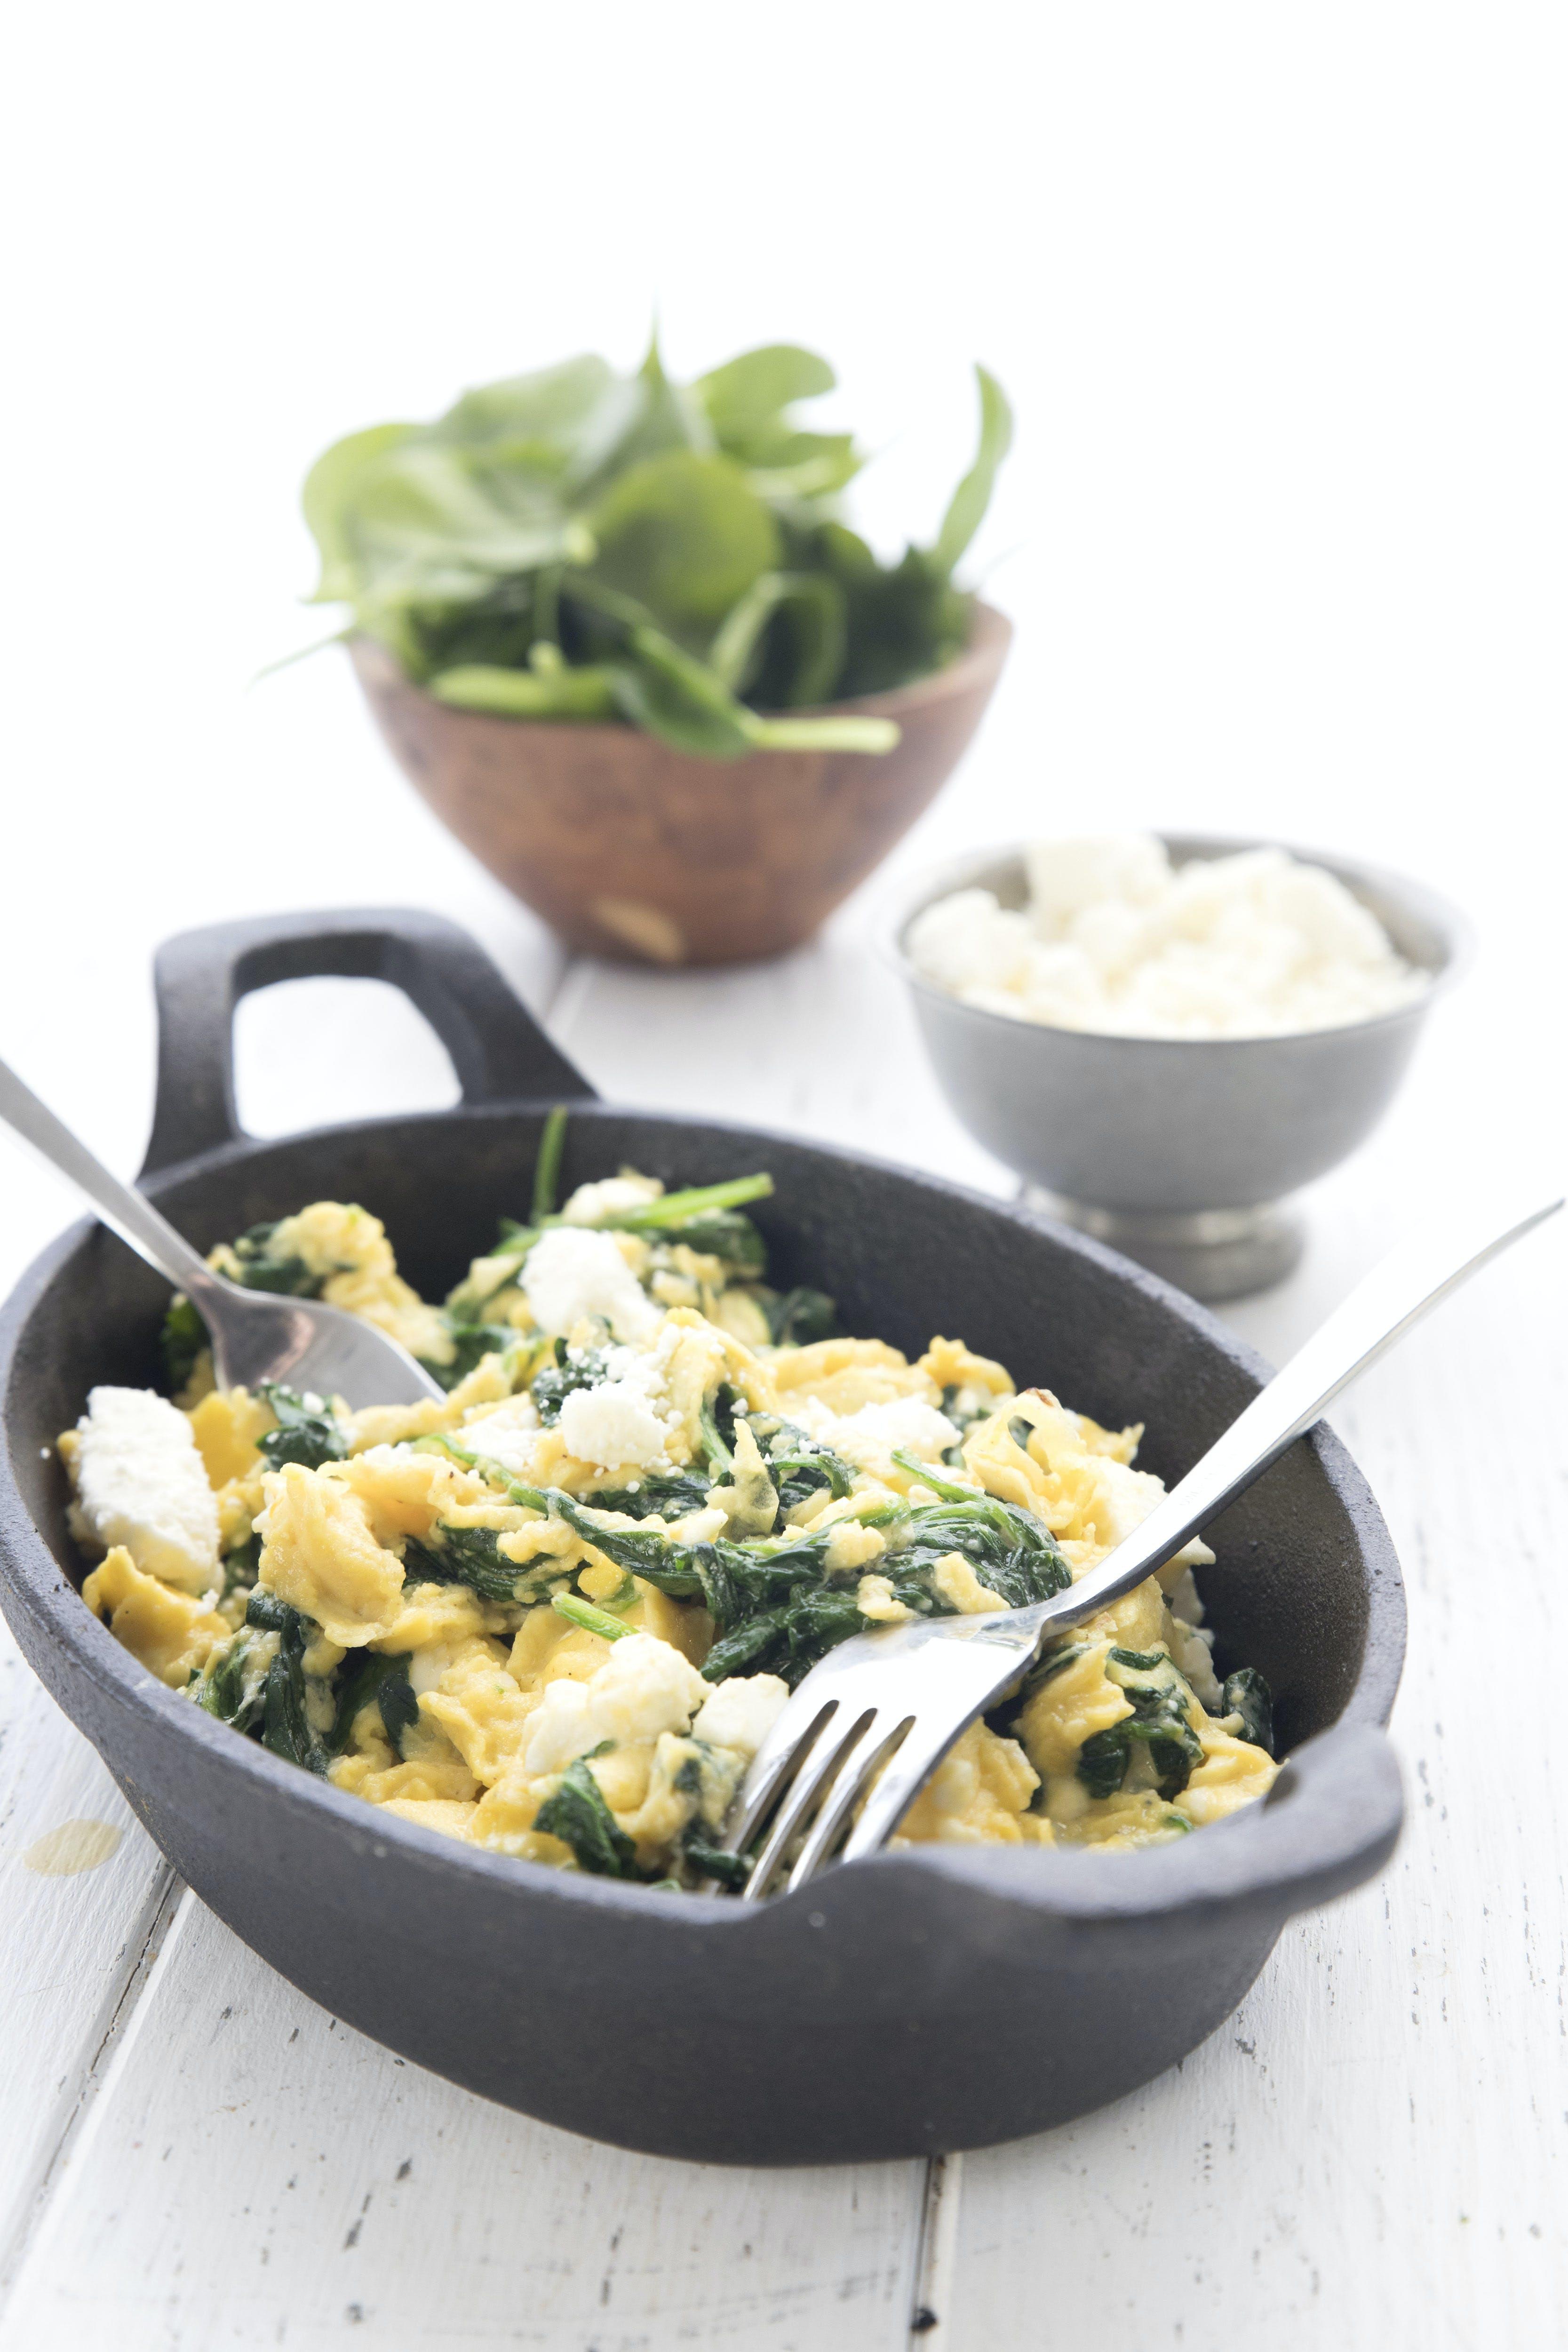 Spinach and feta breakfast scramble